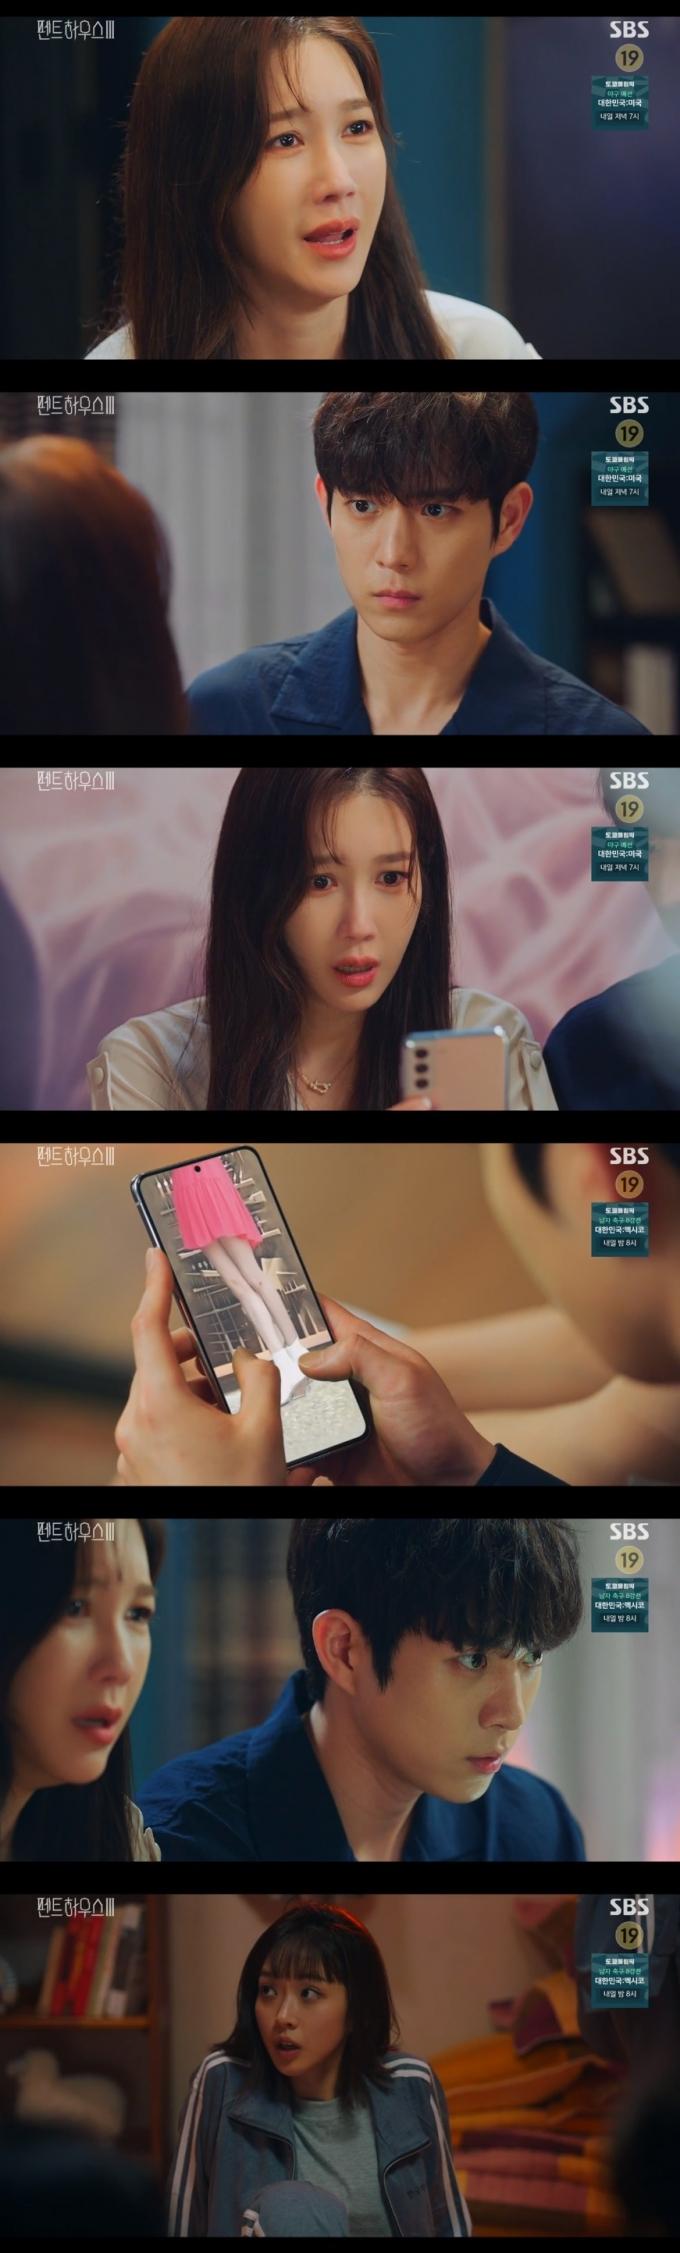 SBS '펜트하우스3' 캡처 © 뉴스1